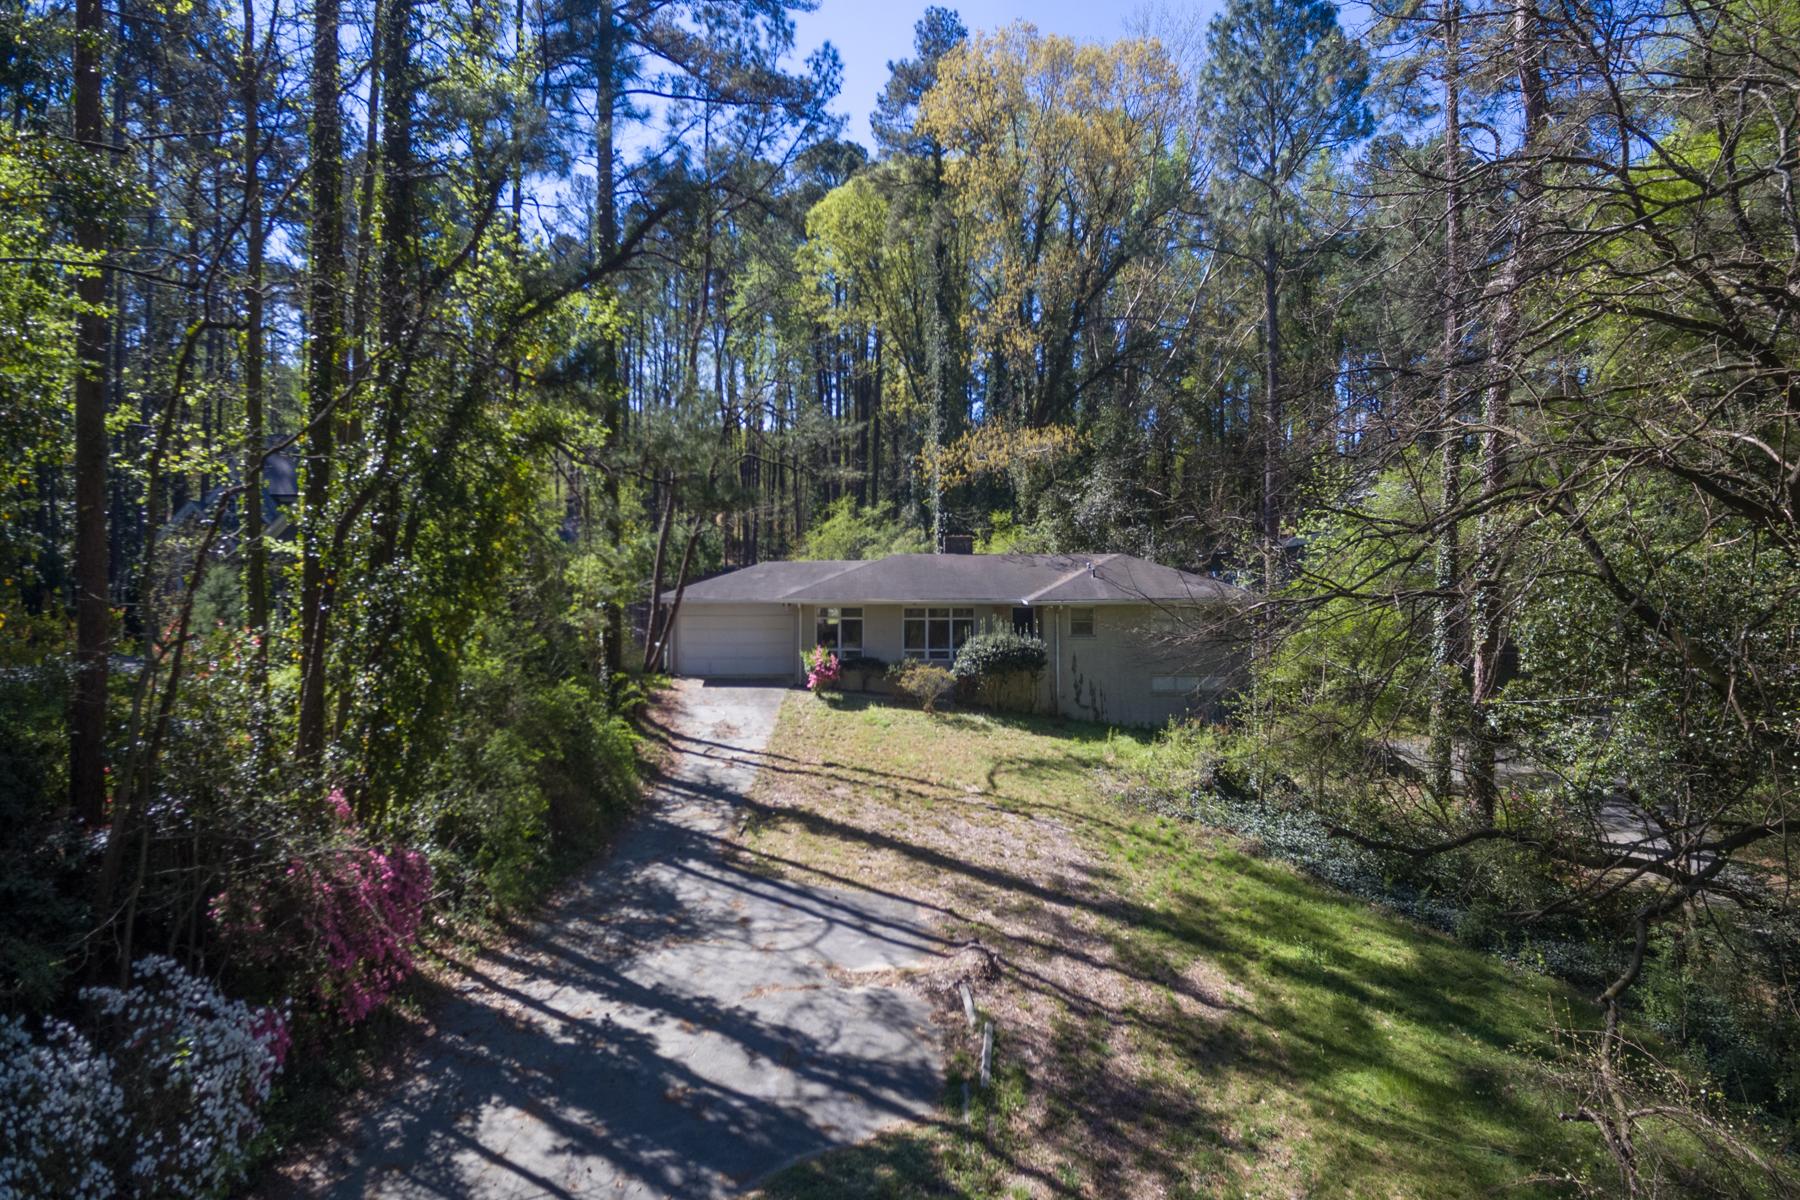 Terreno para Venda às Amazing Opportunity In Heart Of Buckhead for 1.52 Acres 1085 Ferncliff Road NE Pine Hills, Atlanta, Geórgia, 30324 Estados Unidos